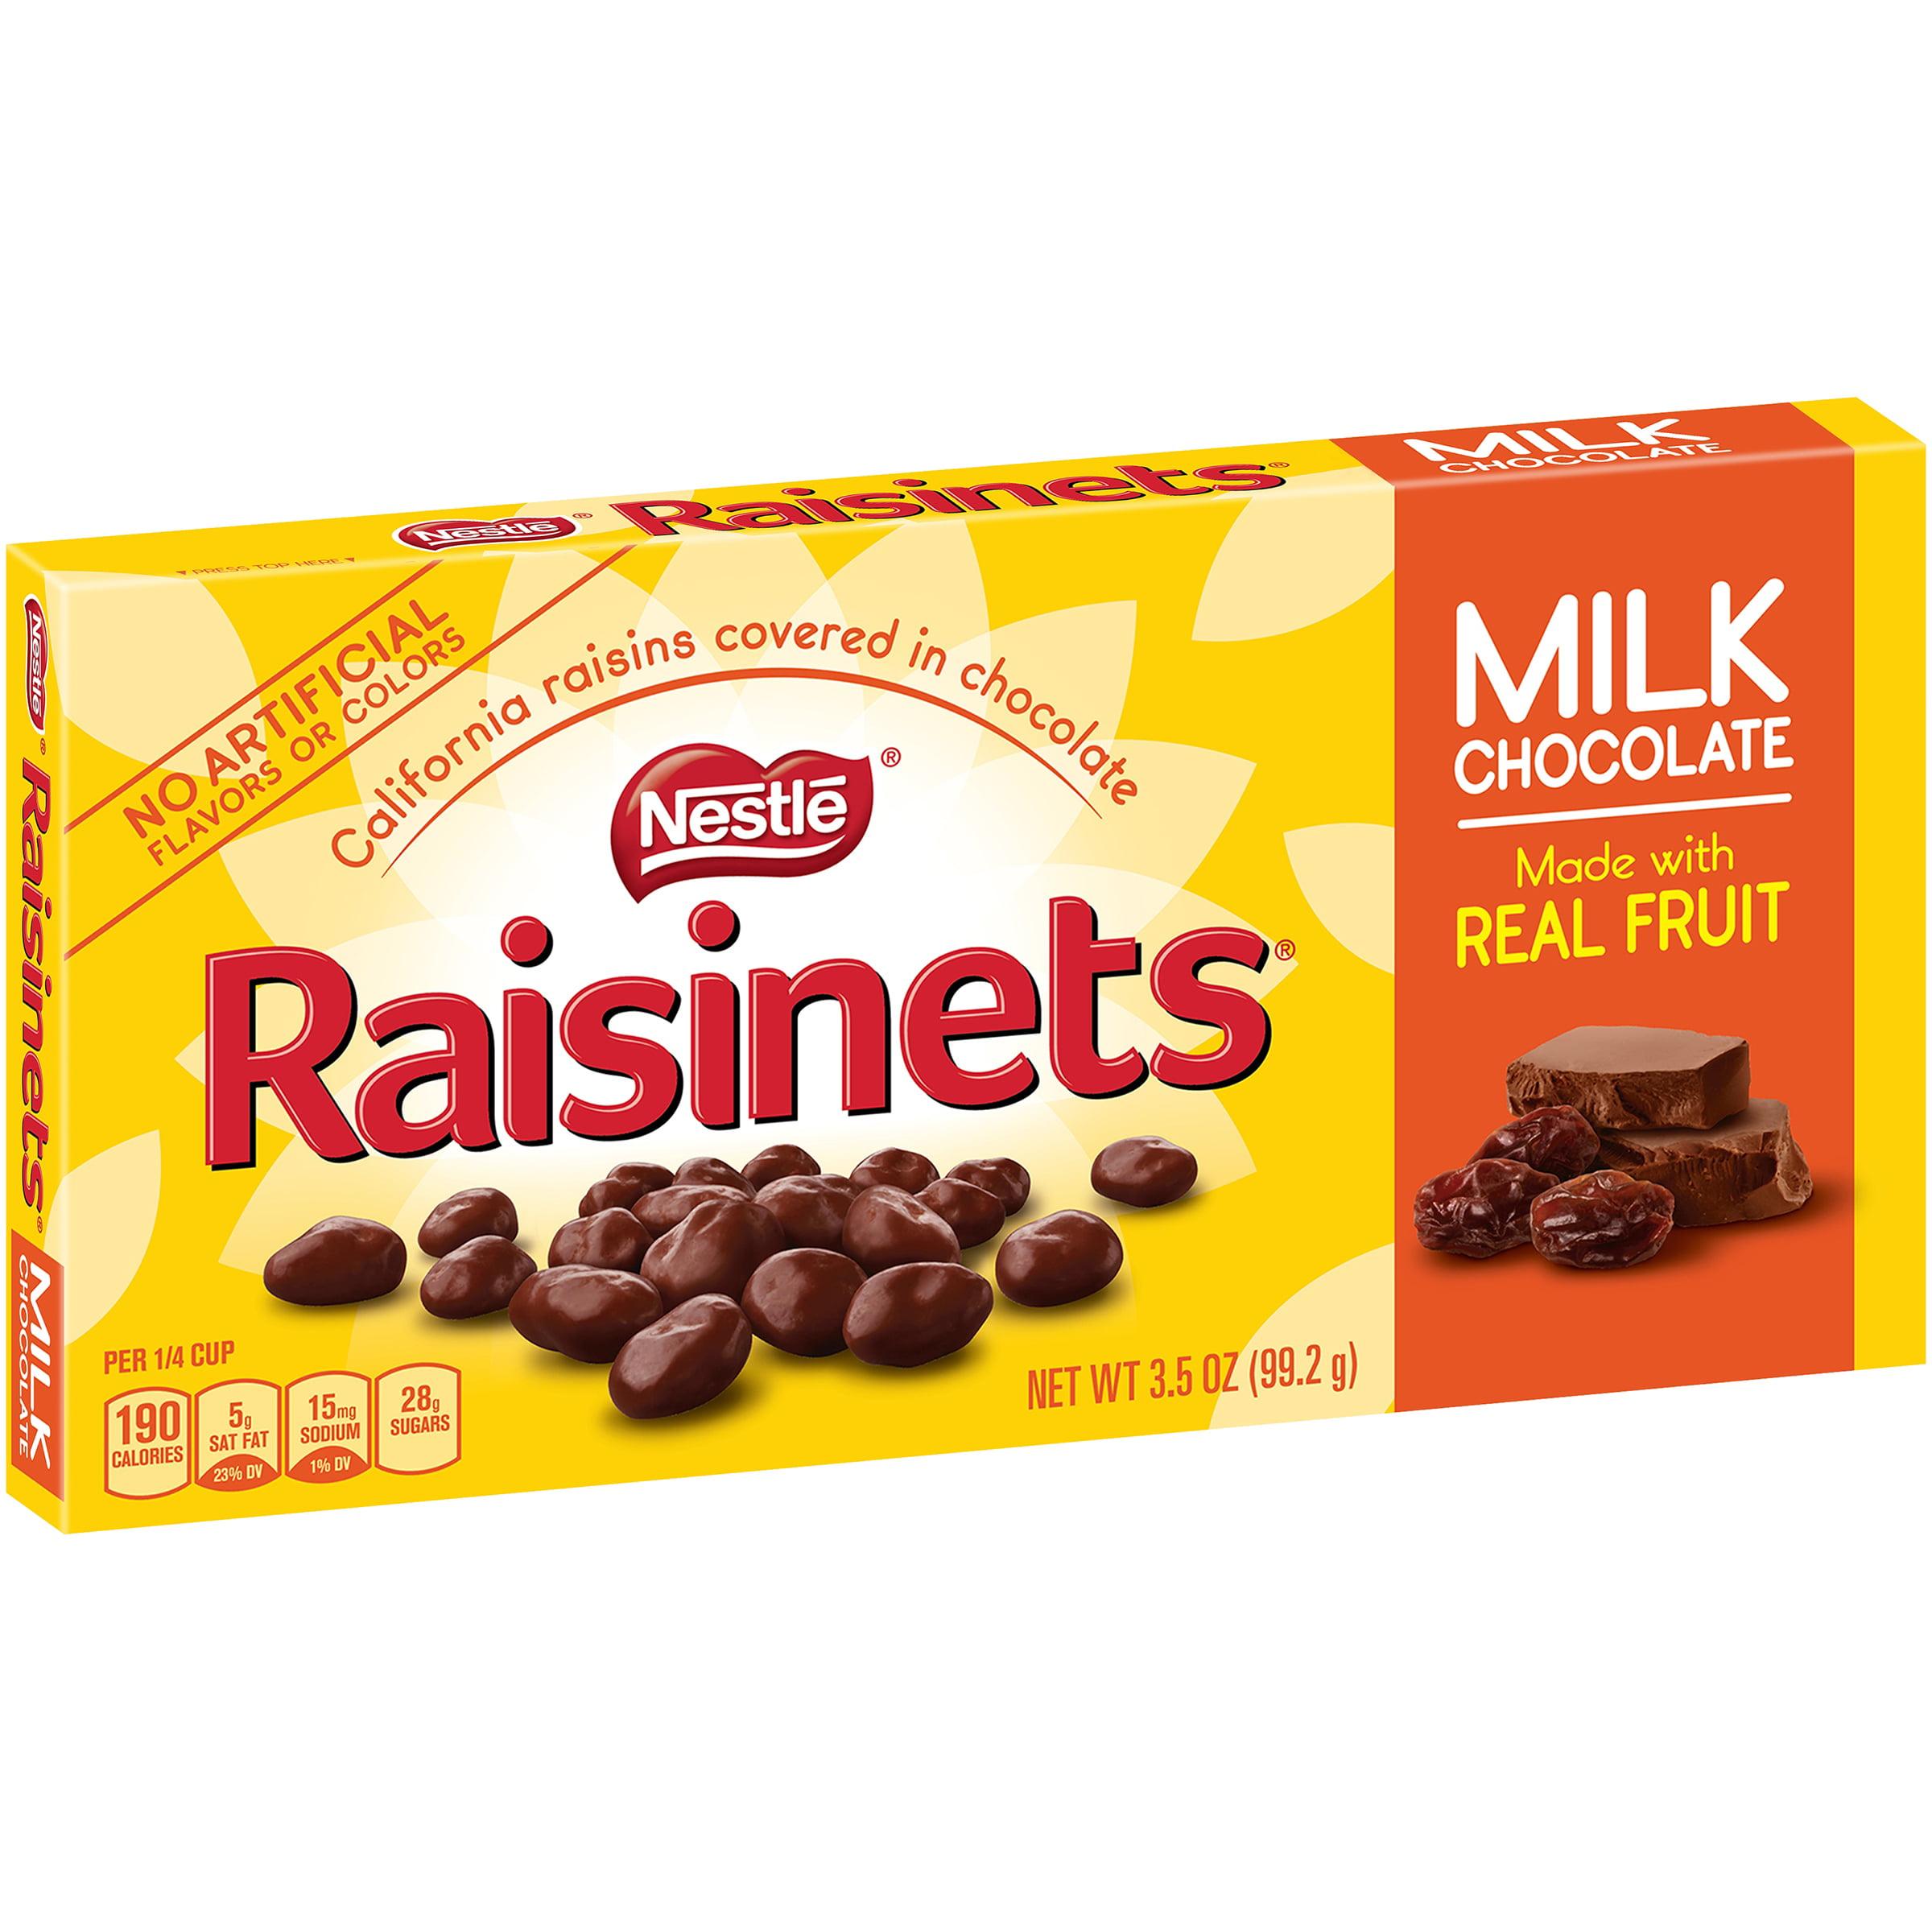 RAISINETS Milk Chocolate Covered Raisins 3.5 oz. Video Box ...